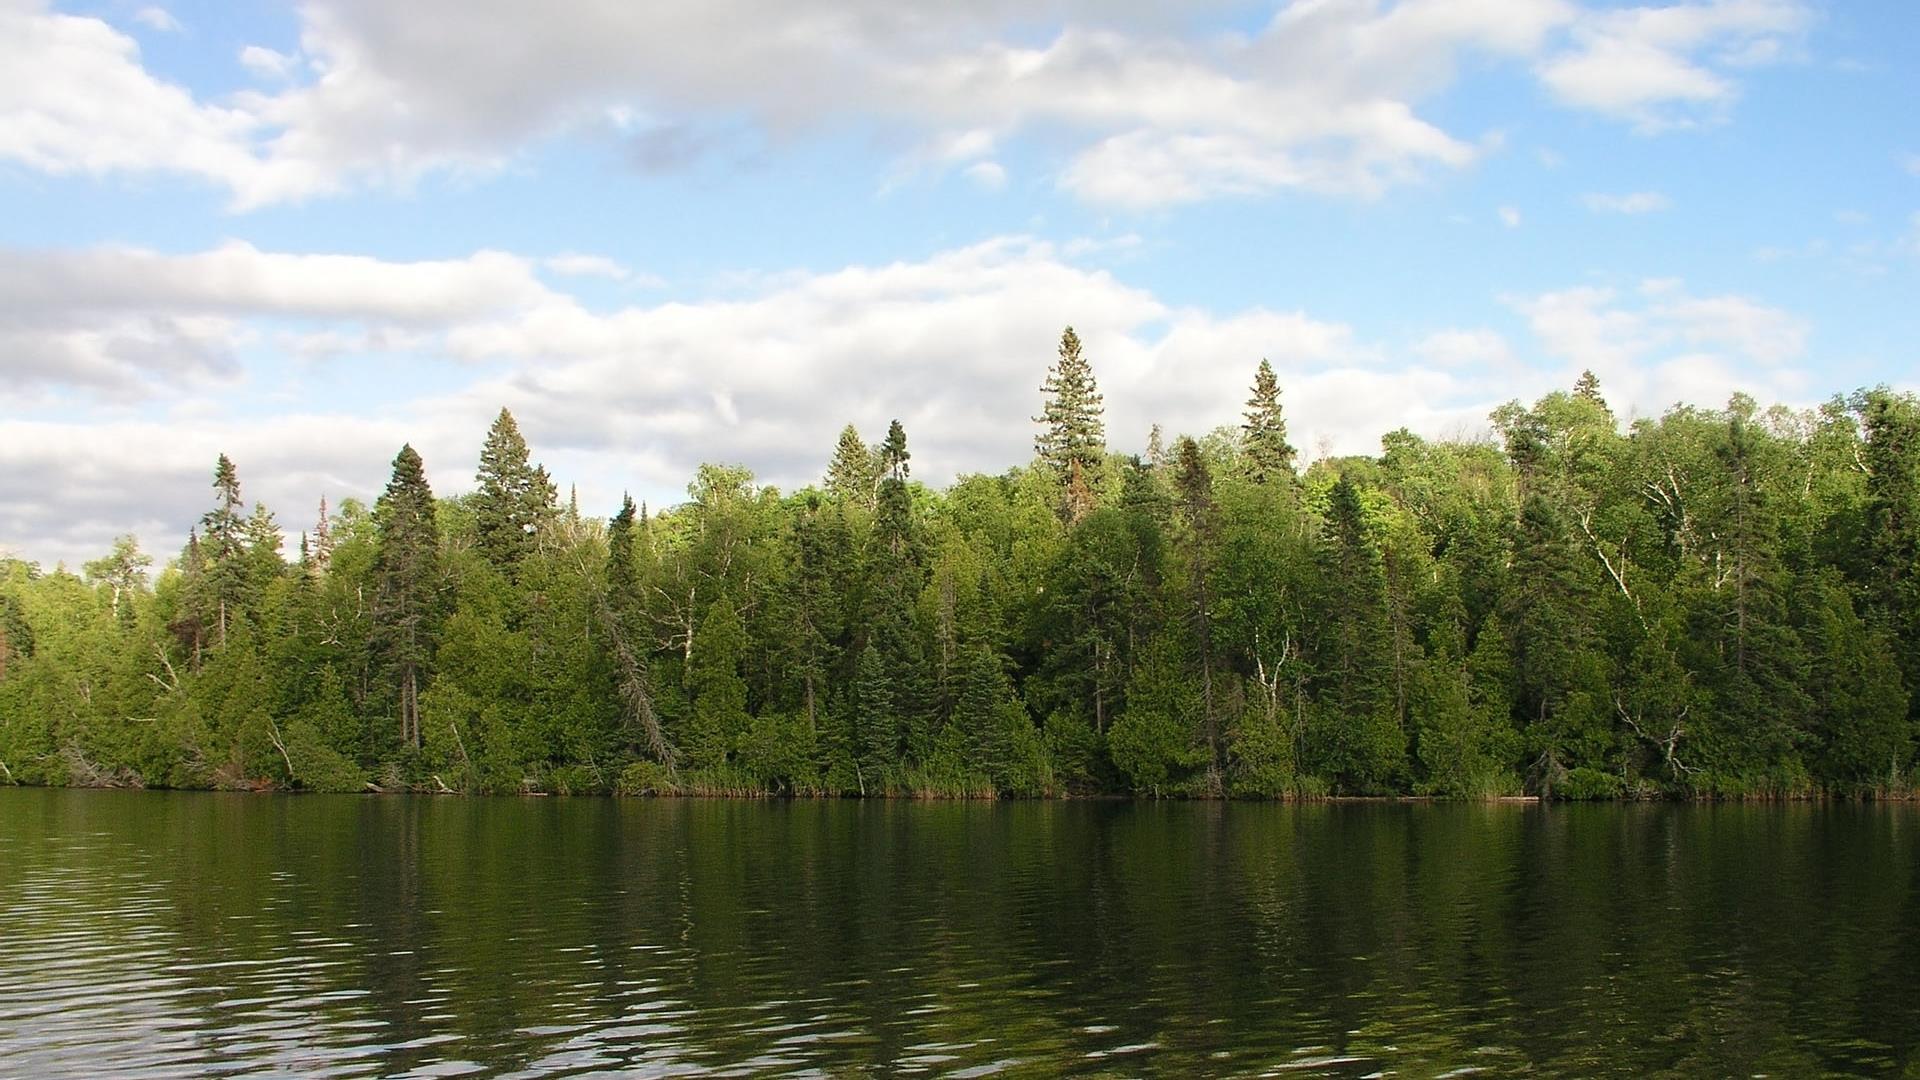 arbres-et-foret_nature-verte_1